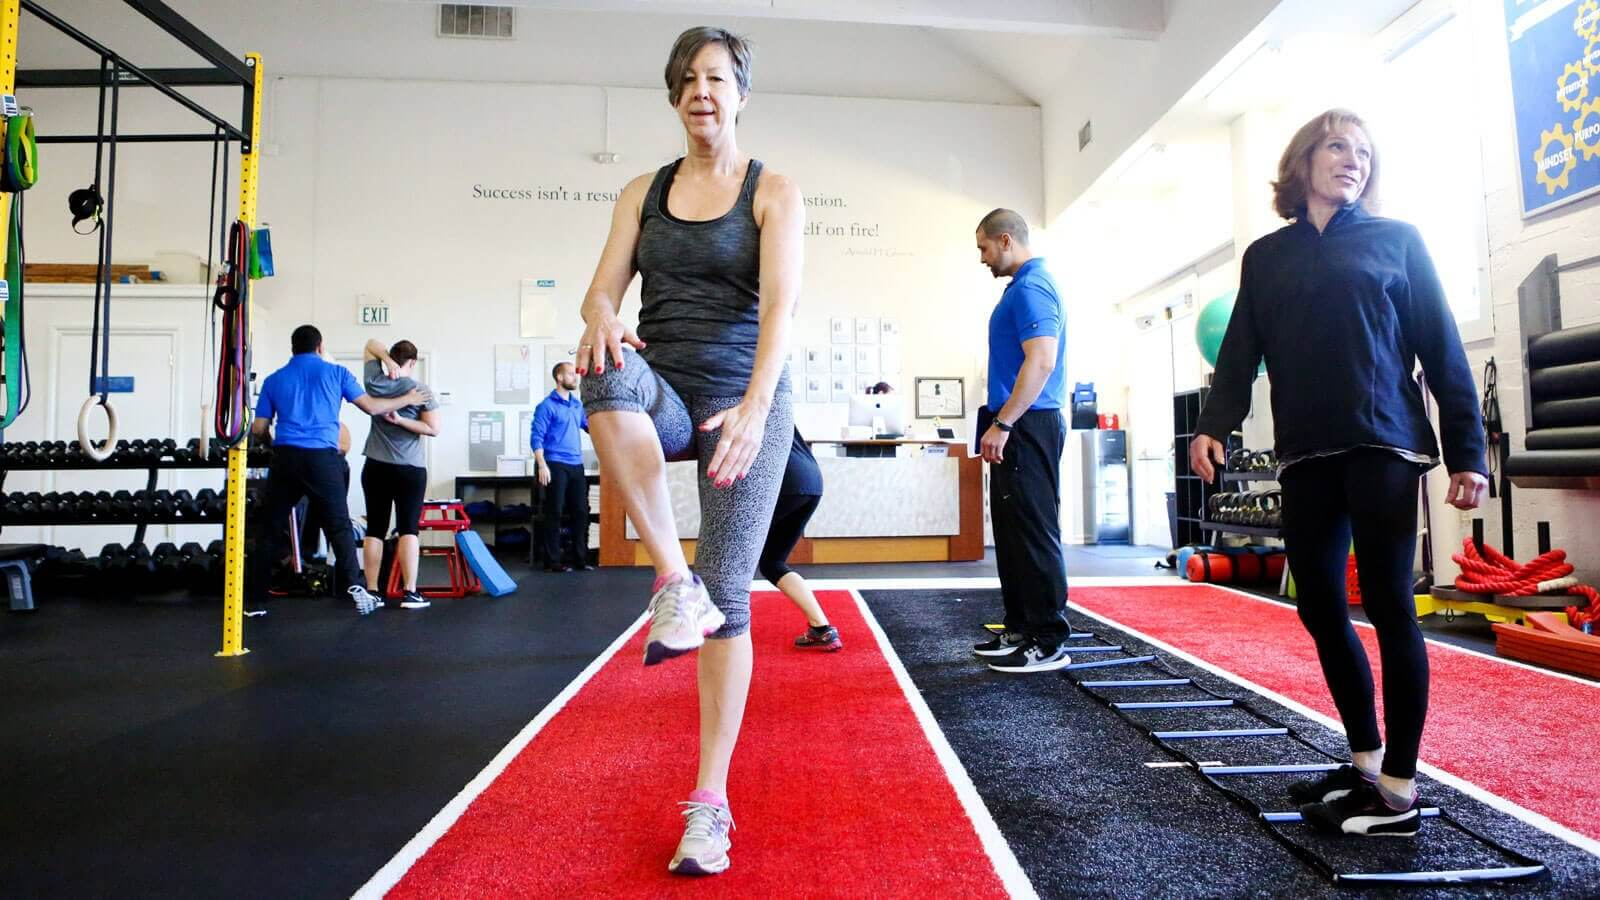 Mint Condition Fitness Semi-private training